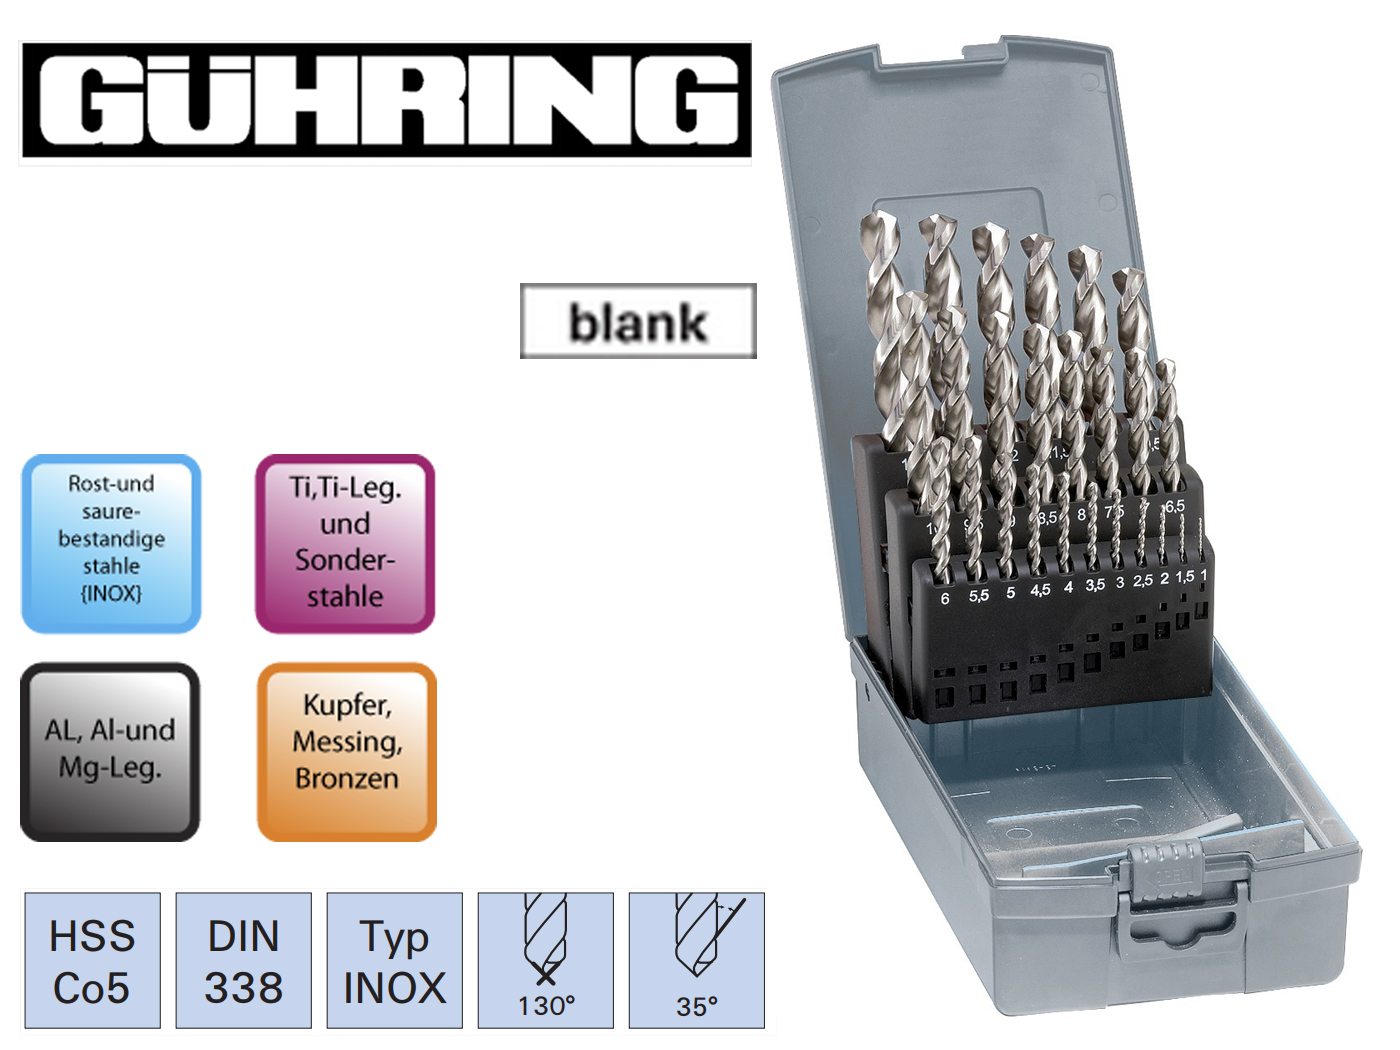 Spiraalboren set DIN 338 VA HSSECo5 Guhring | DKMTools - DKM Tools